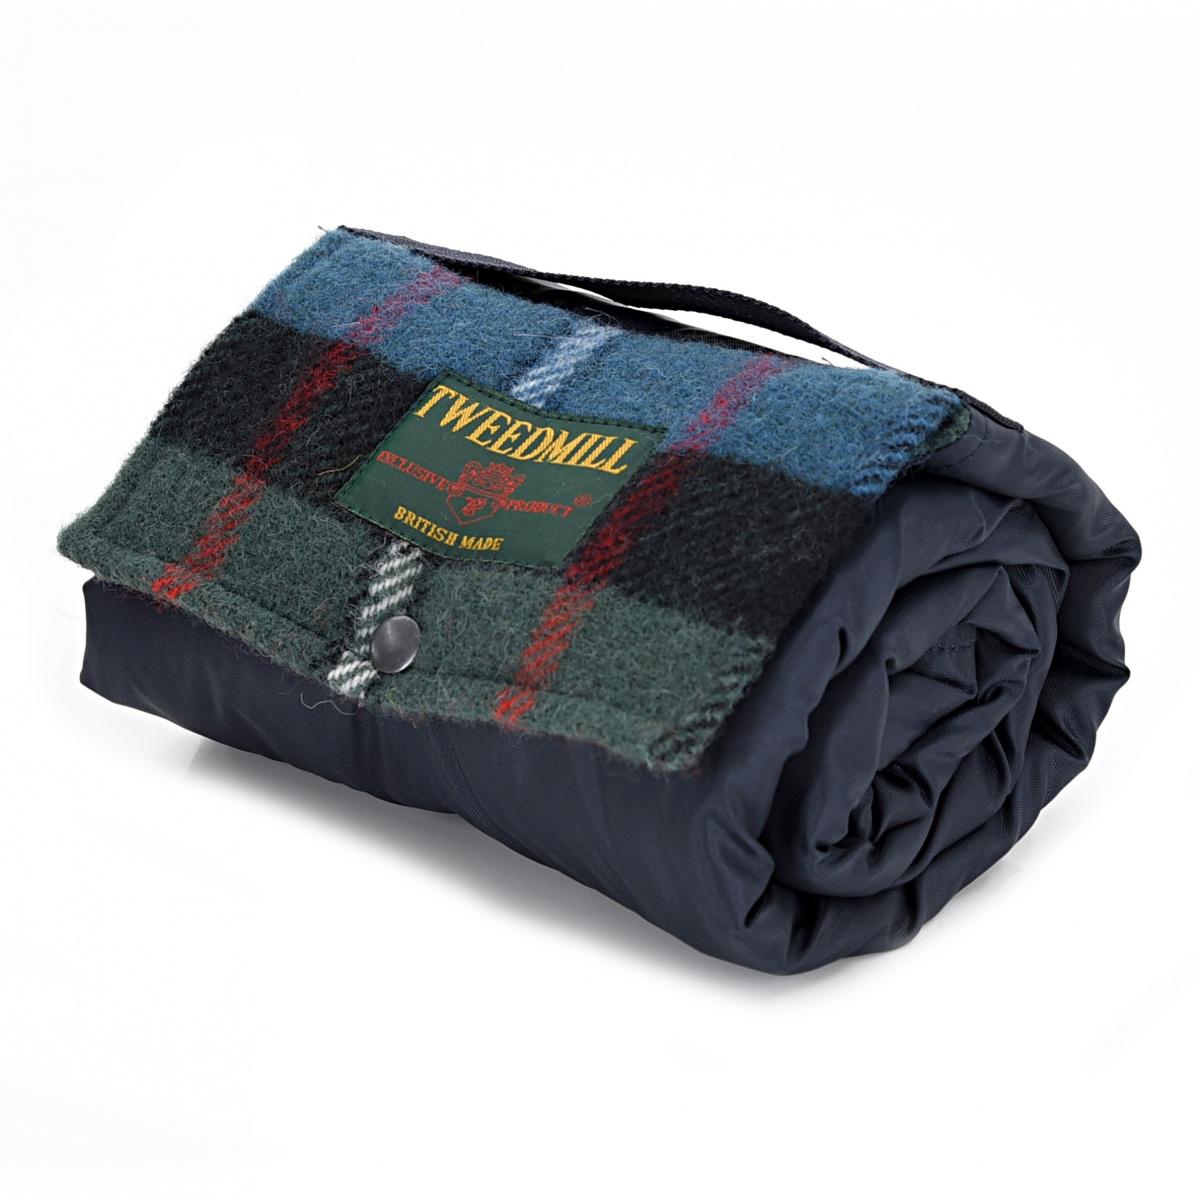 Tweedmill picnictæppe til 1 pers. - Navy / Ferguson